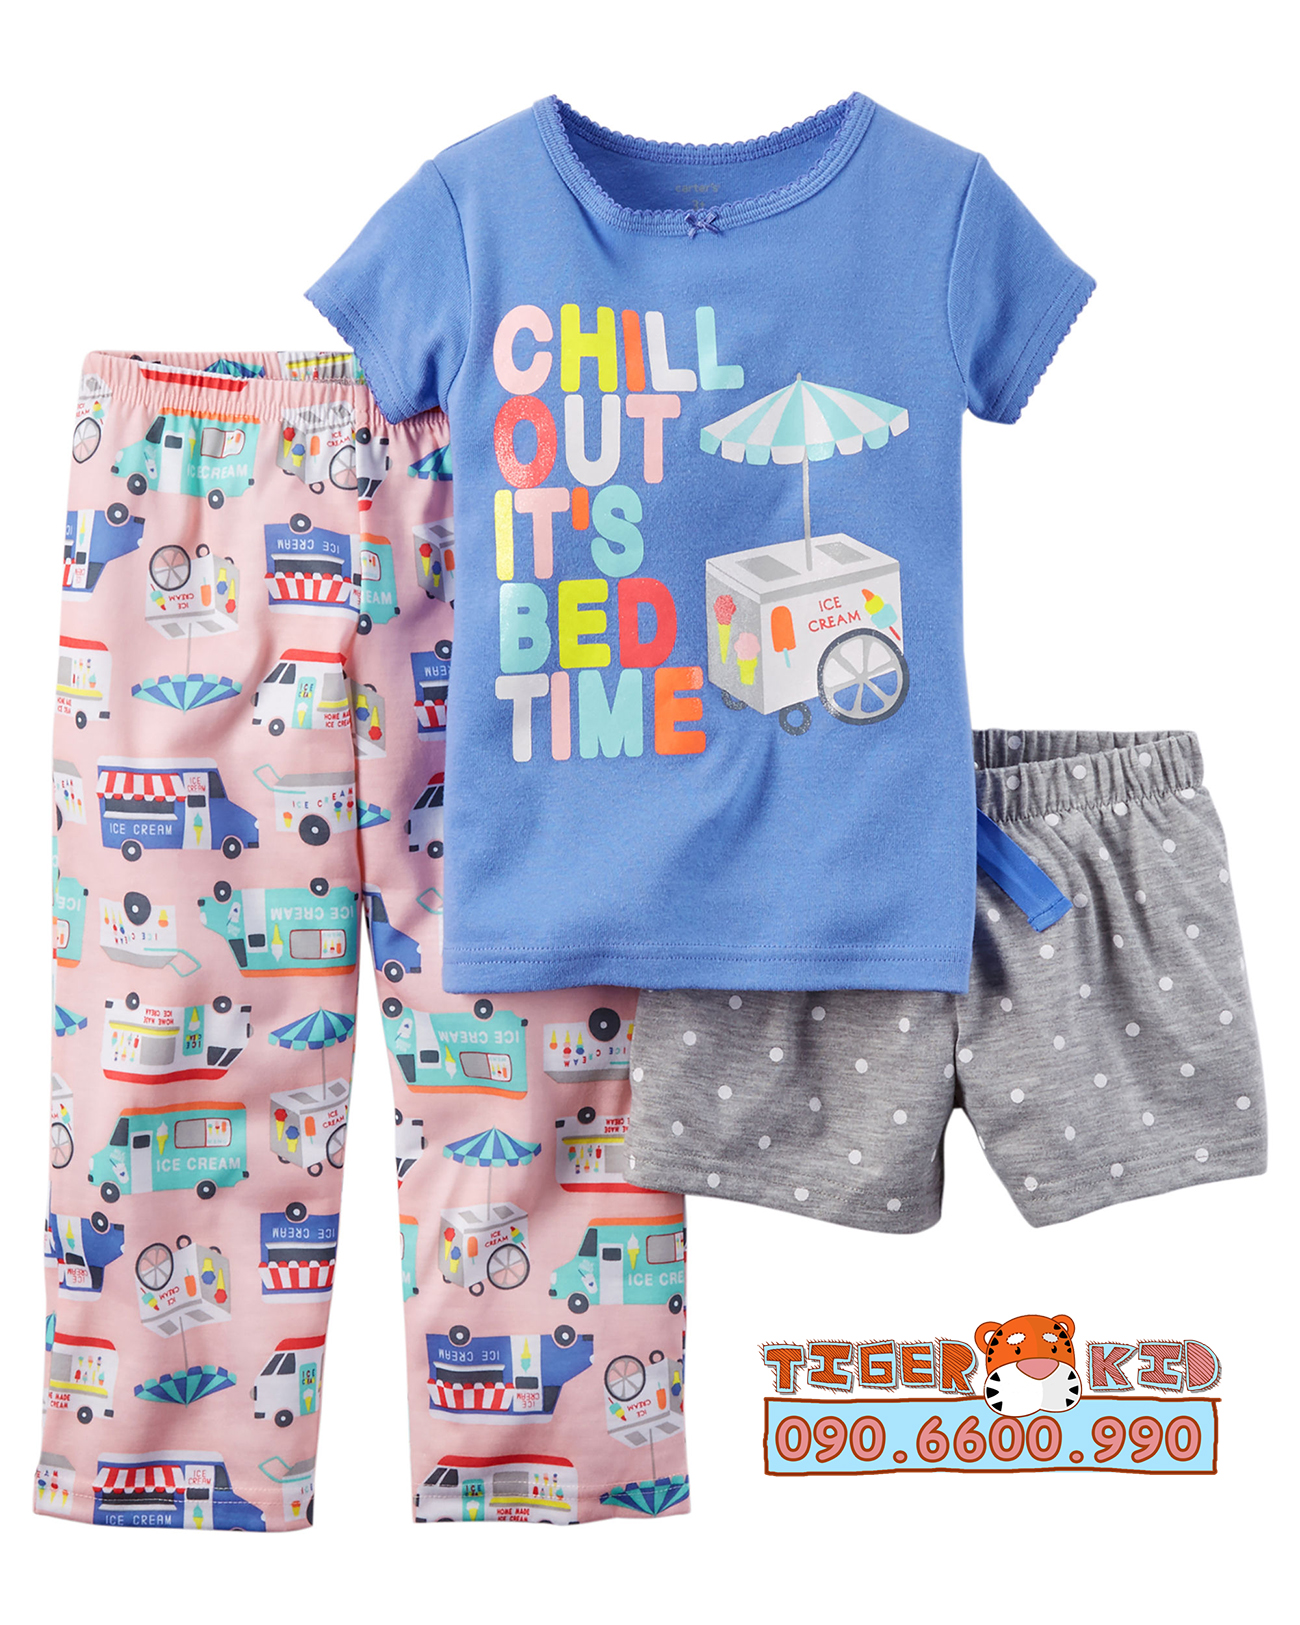 28262735786 2f8917ee1c o Bộ set Pijamas 12M 18M 24M